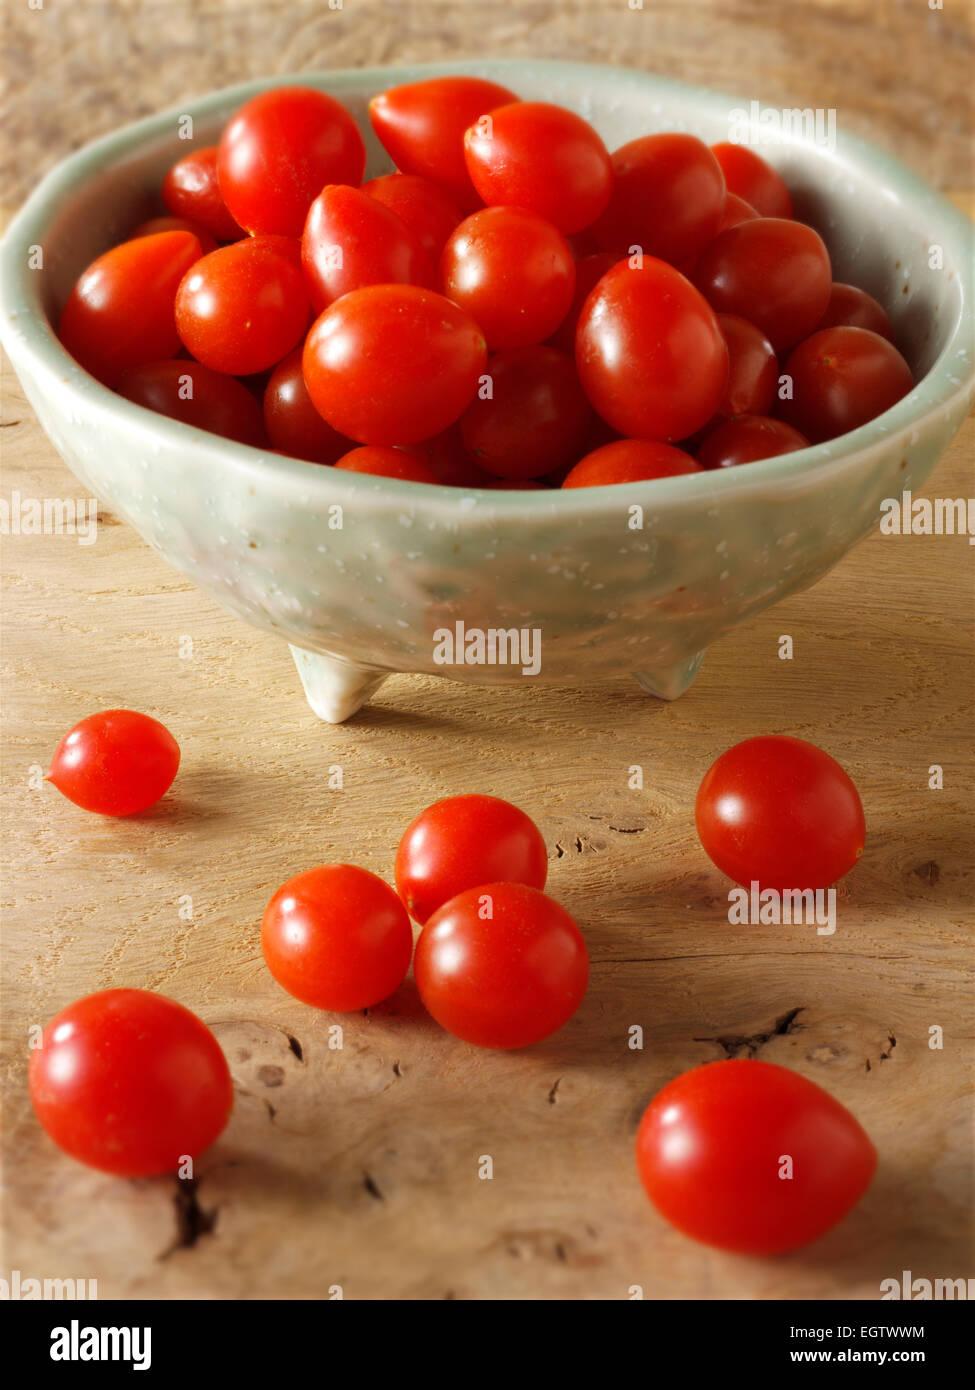 Fresh Tom Tom tomatoes - Stock Image